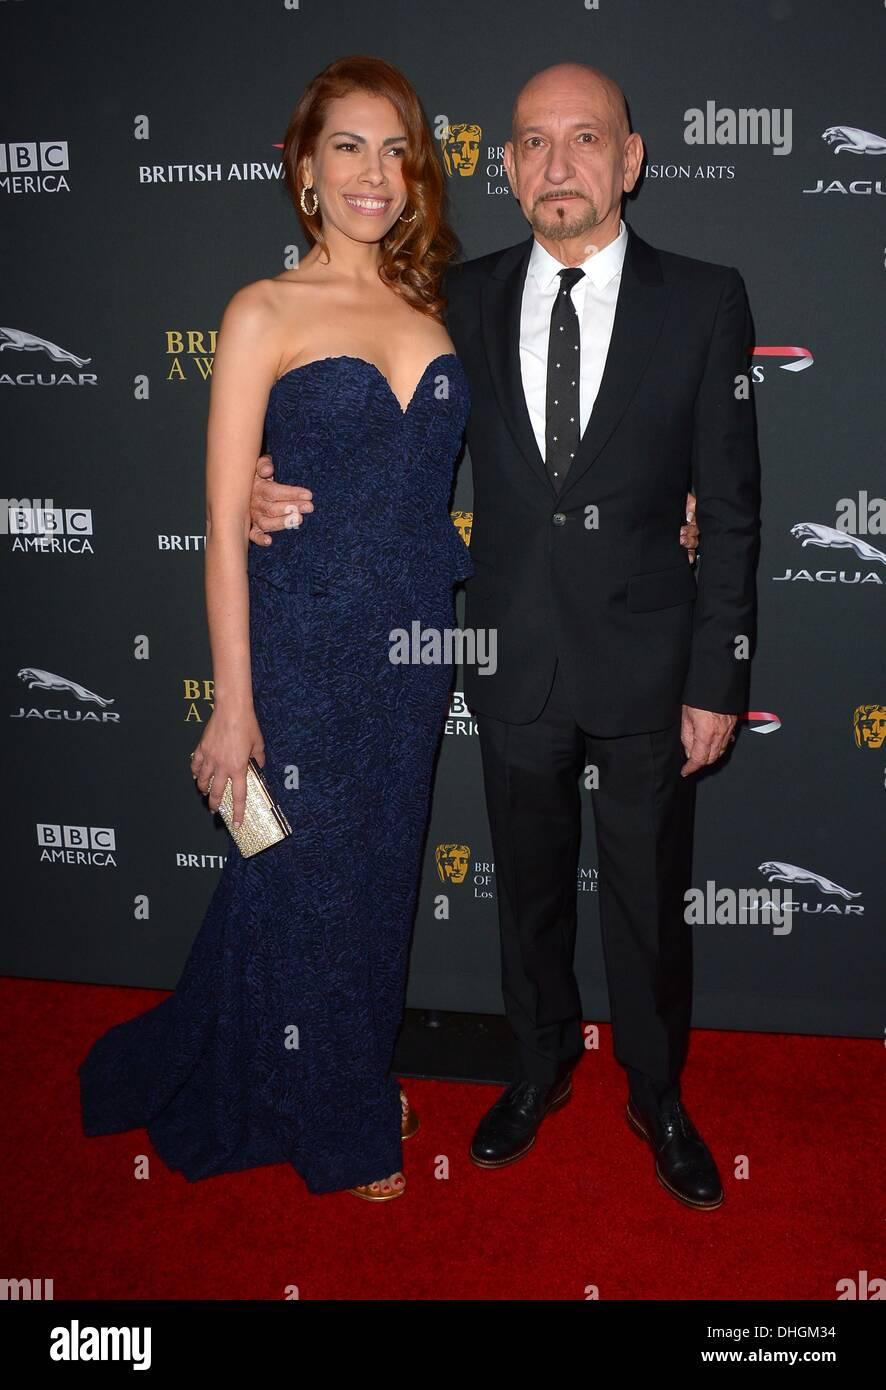 Sir Ben Kingsley arrives at the BAFTA LA Britannia Awards in Los Angeles, California, November 9th 2013 - Stock Image